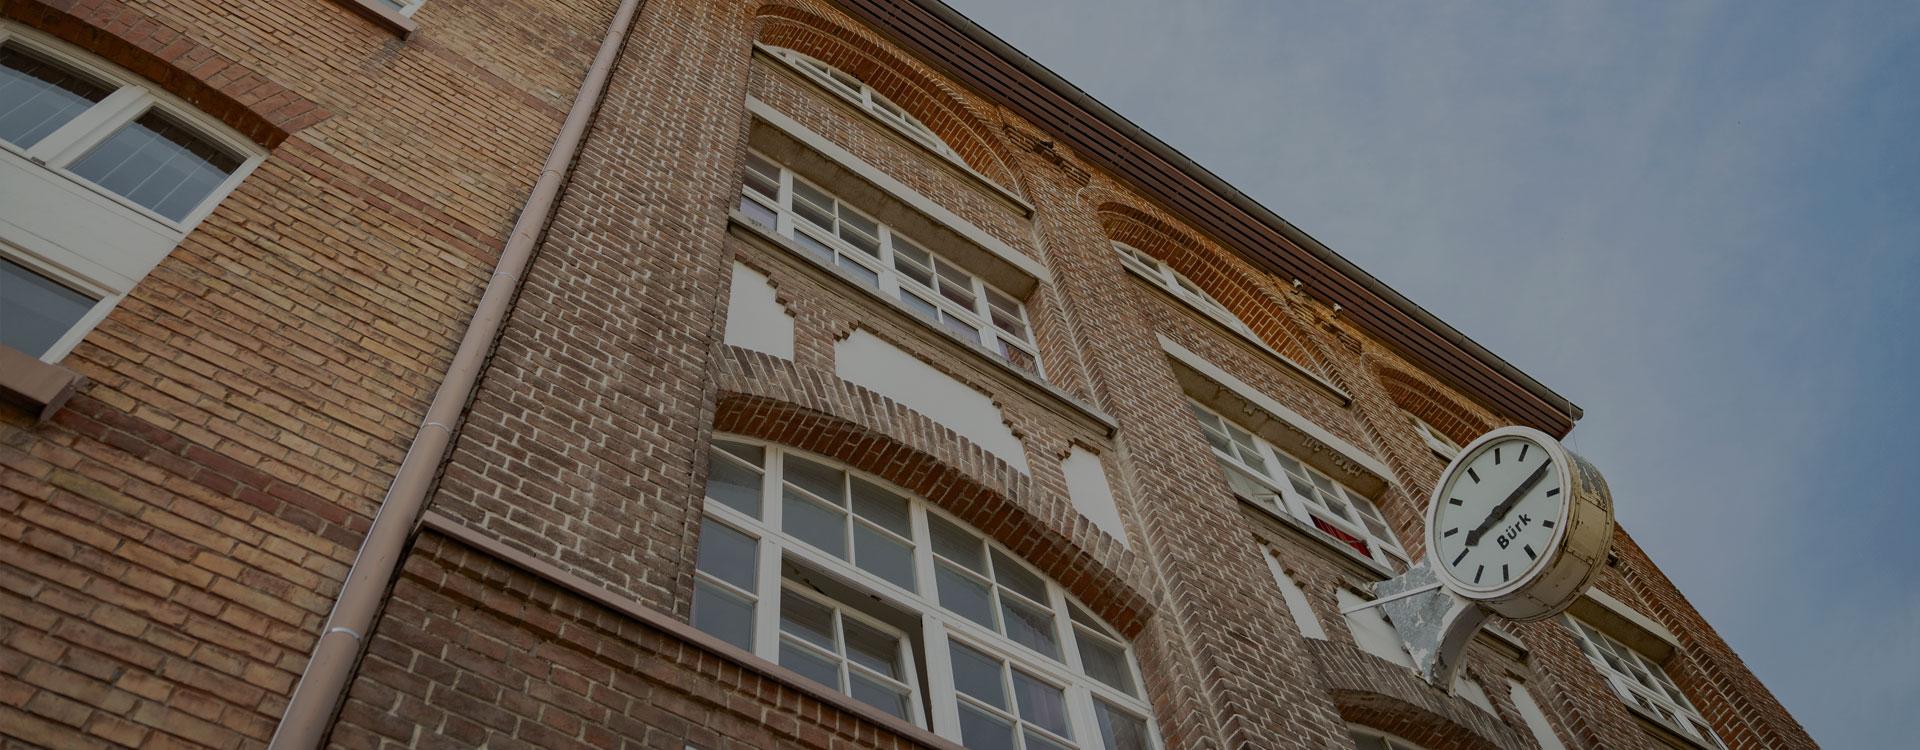 Bürkstrasse Gebäude - wbg